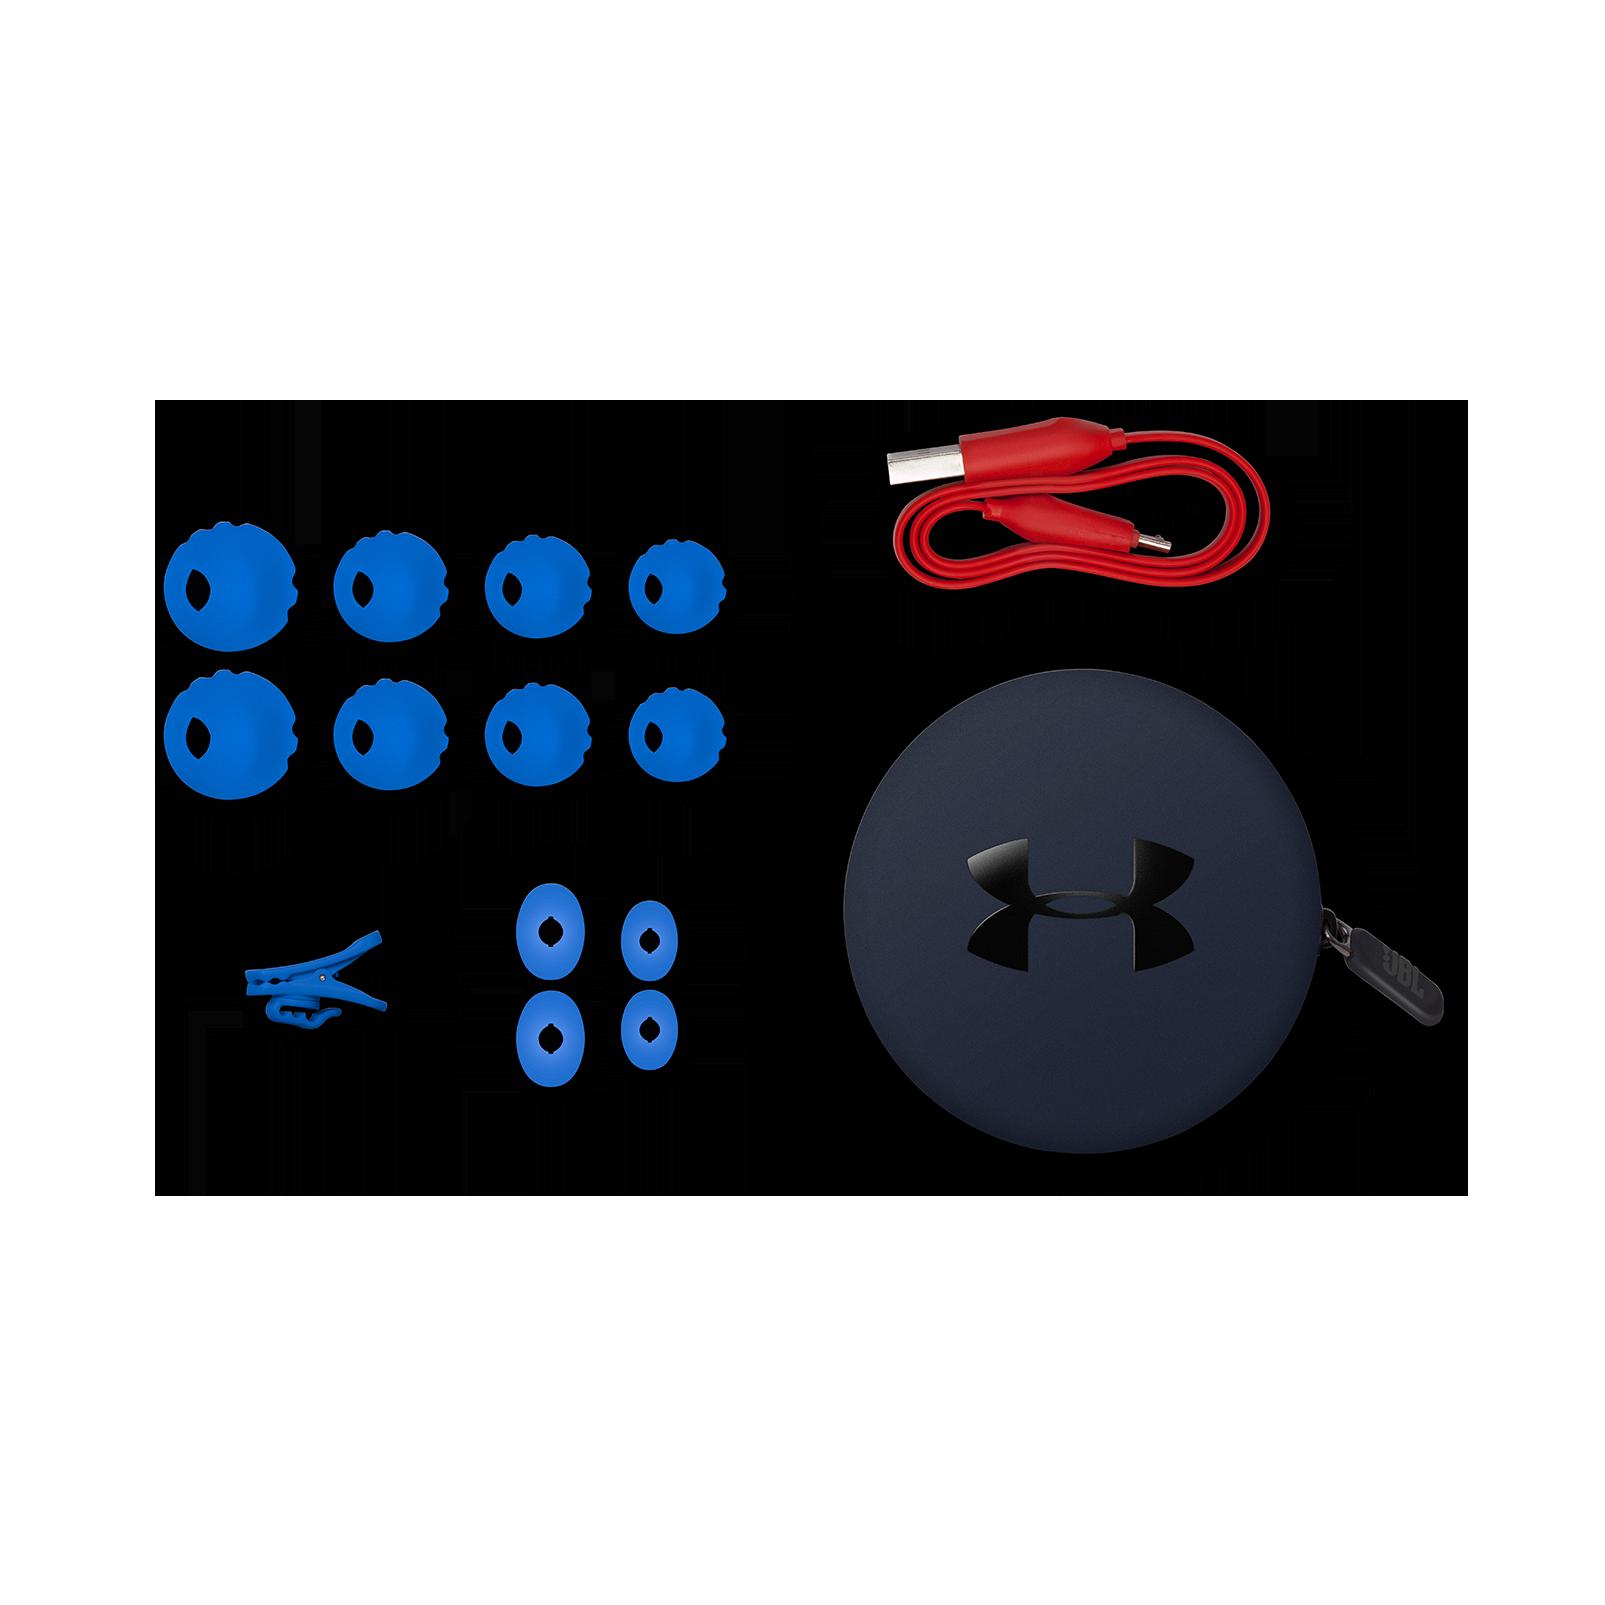 Under Armour Sport Wireless - Blue - Wireless in-ear headphones for athletes - Detailshot 4